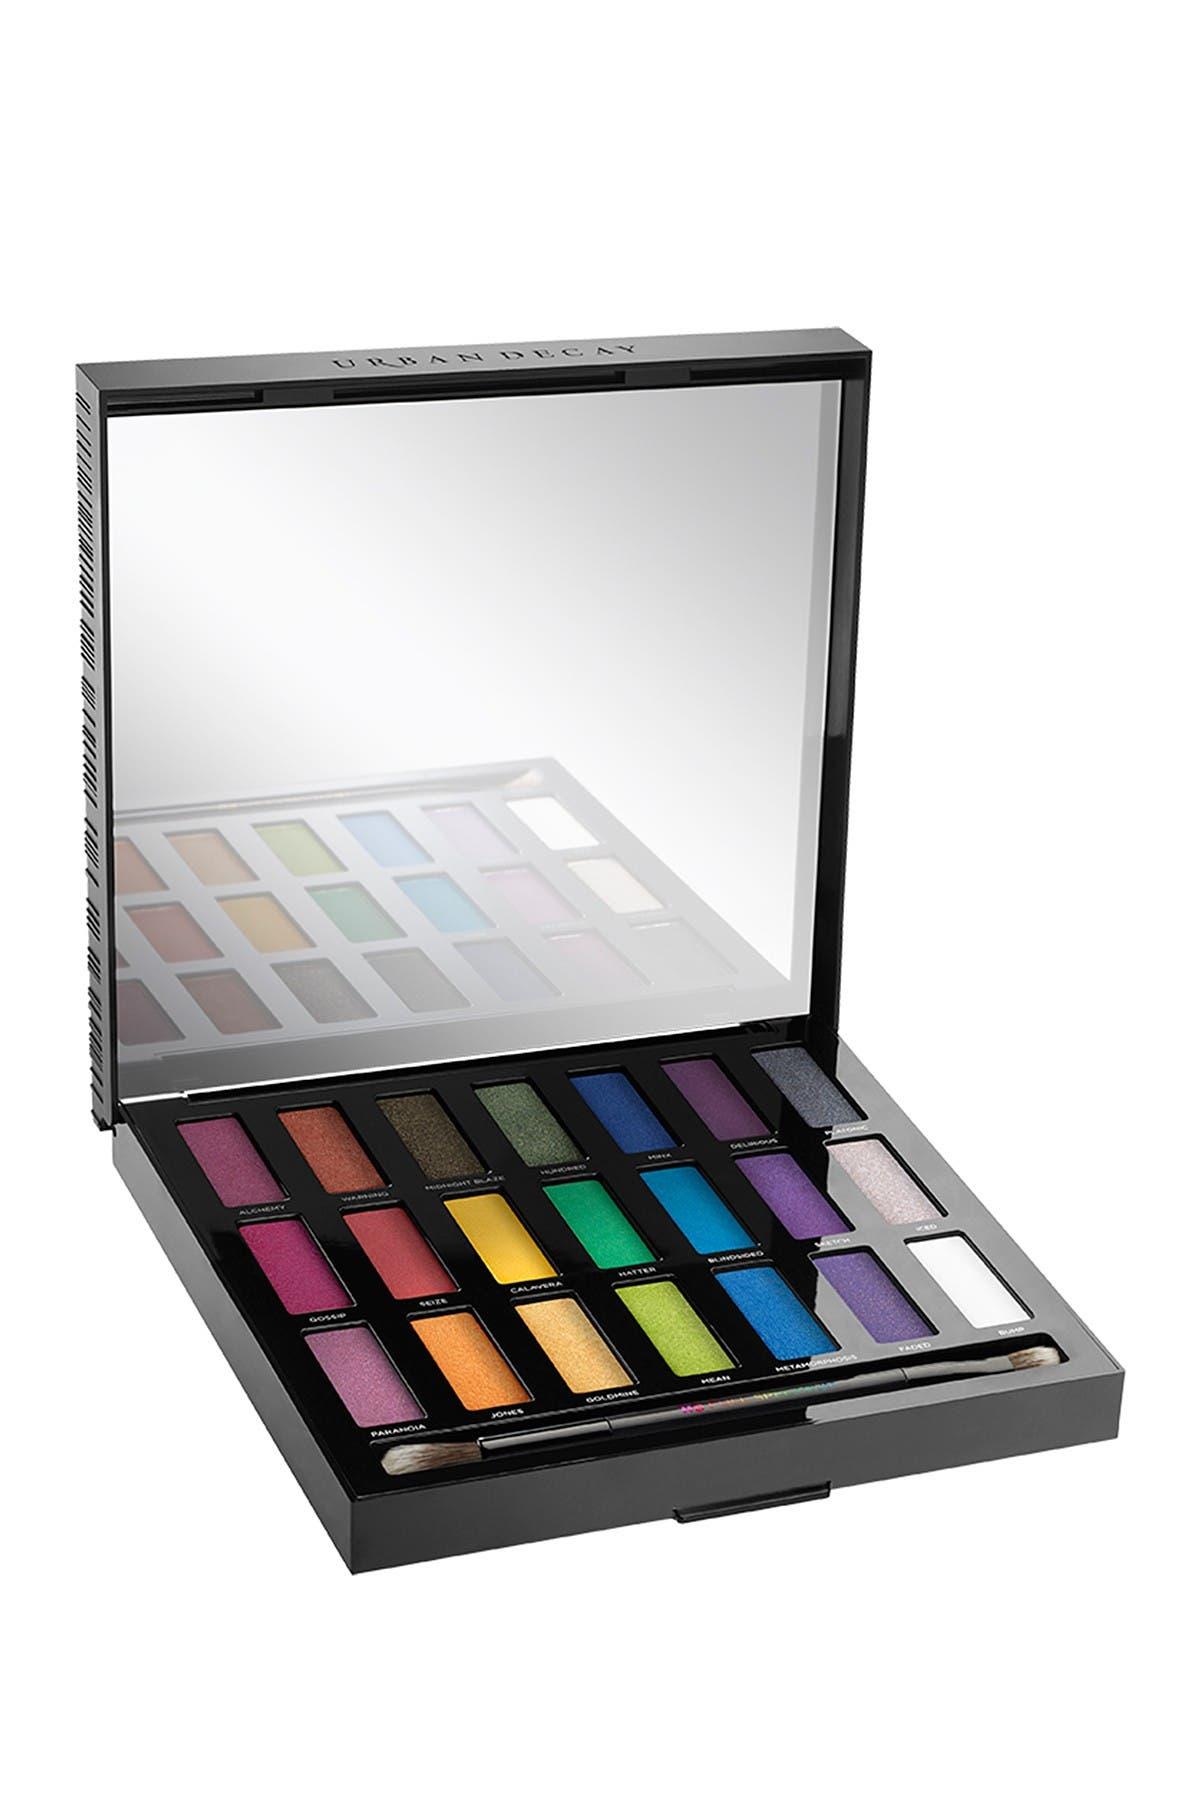 Image of Urban Decay Full Spectrum Eye Palette